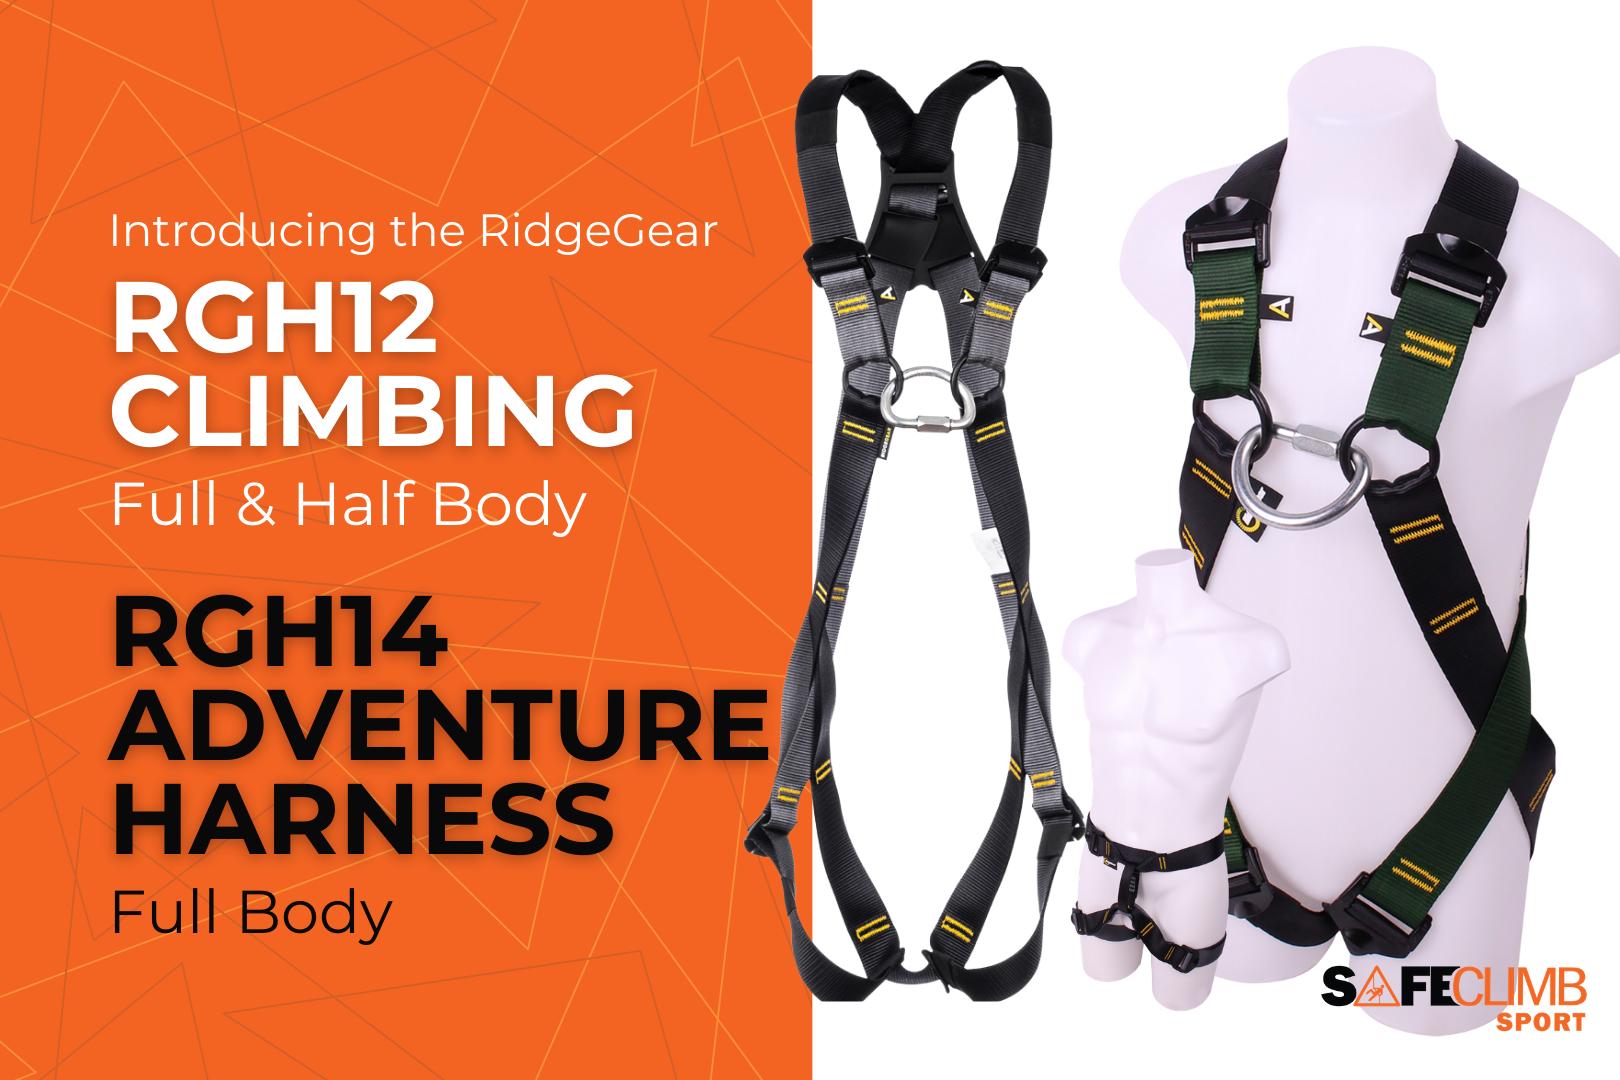 Introducing the RidgeGear RGH12 Climbing Harness & the RGH14 Adventure Harness